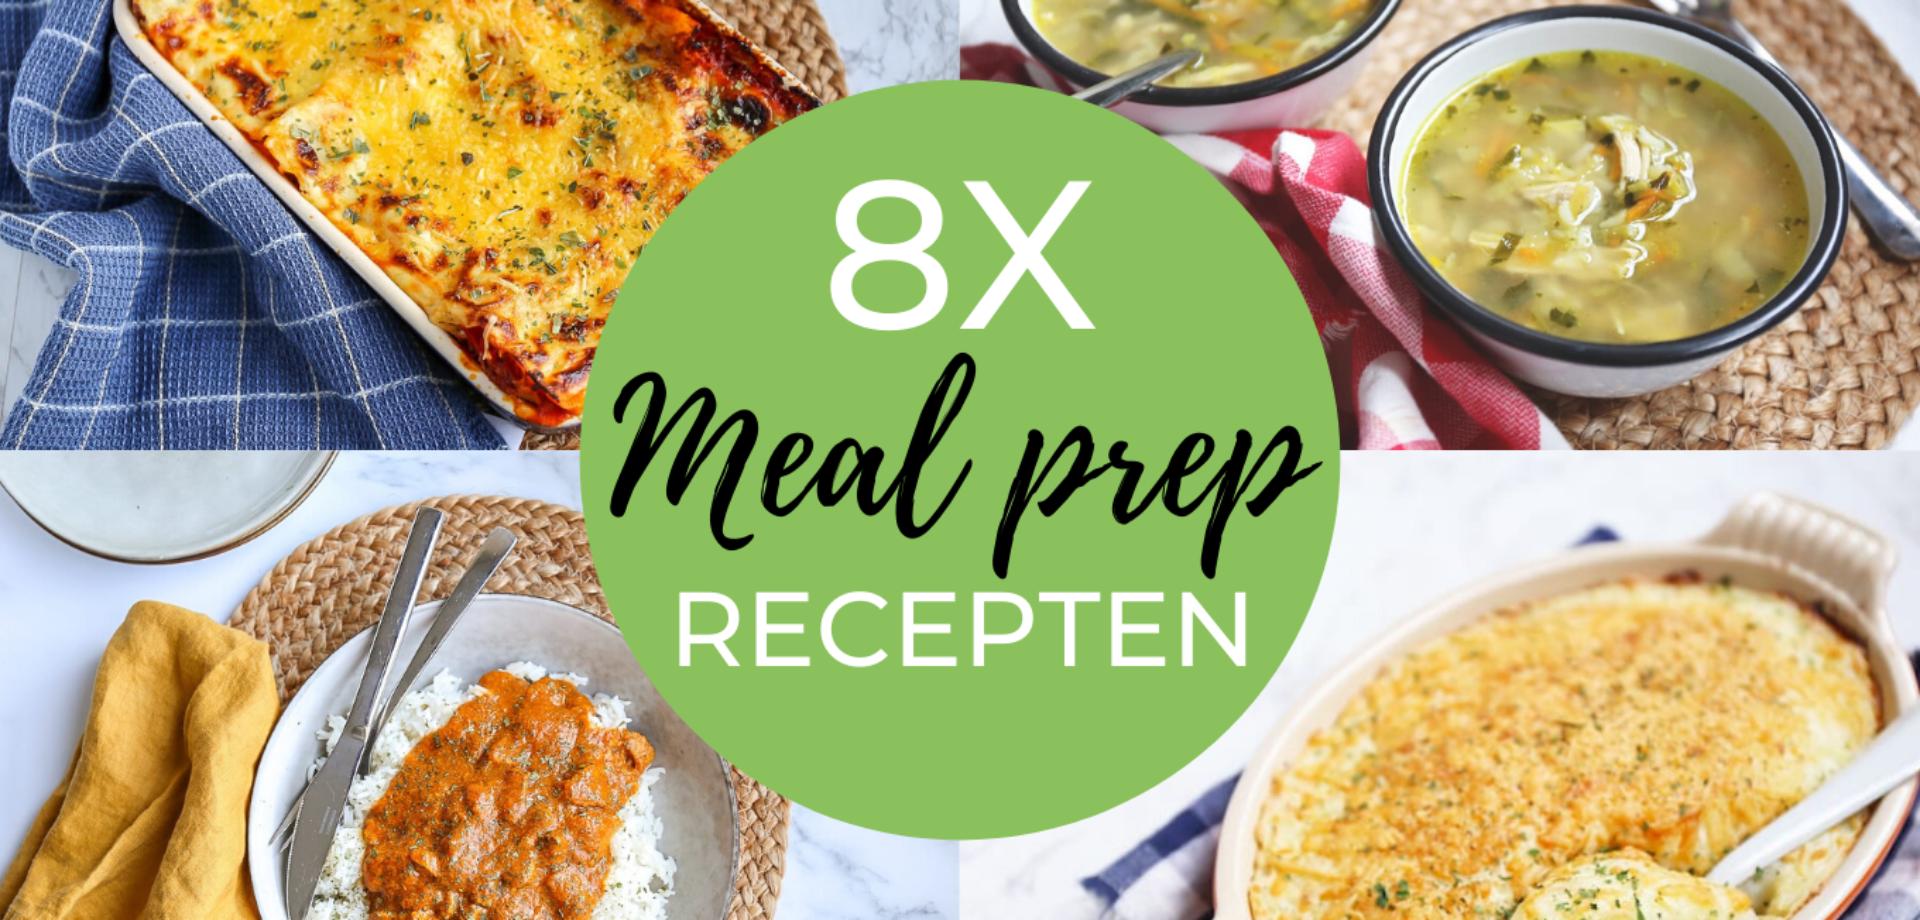 8x meal prep recepten